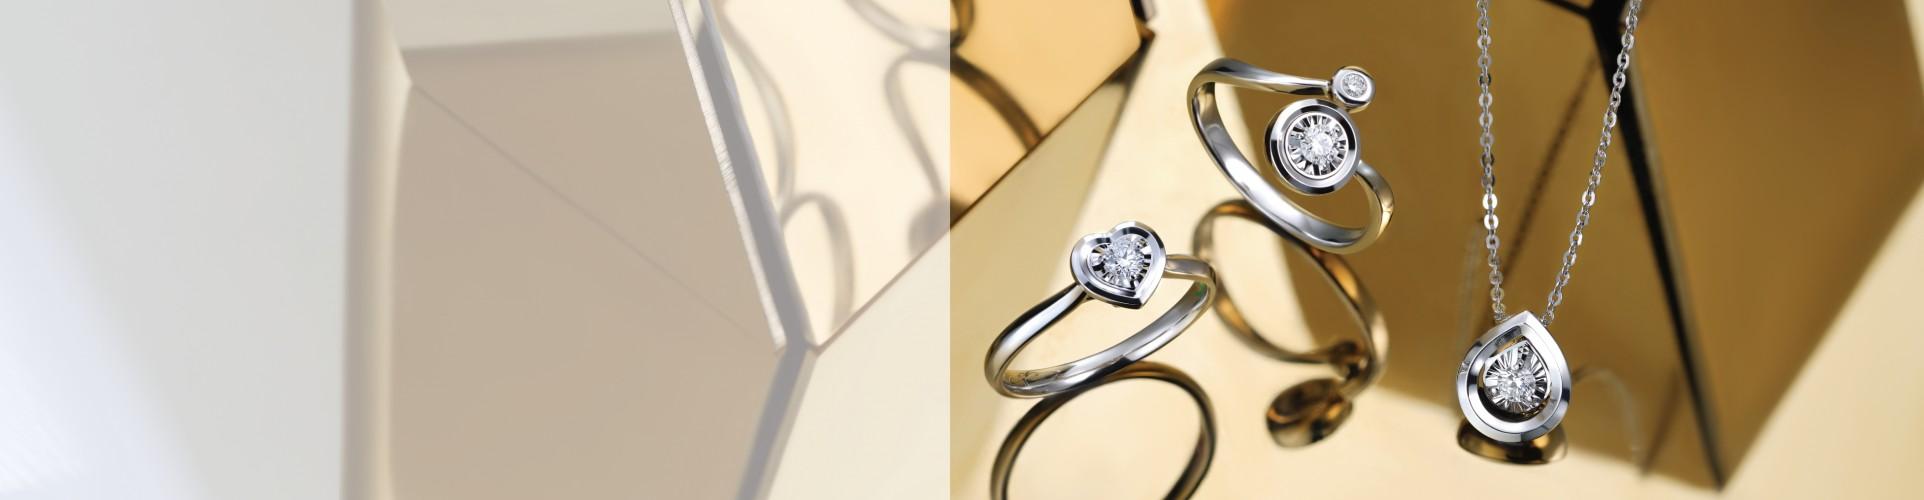 E Store Adelle Jewellery Satu Set Jewelry Tunangan Kawin Pernikahan Berlian Emas Wedding Round Geometric Ring